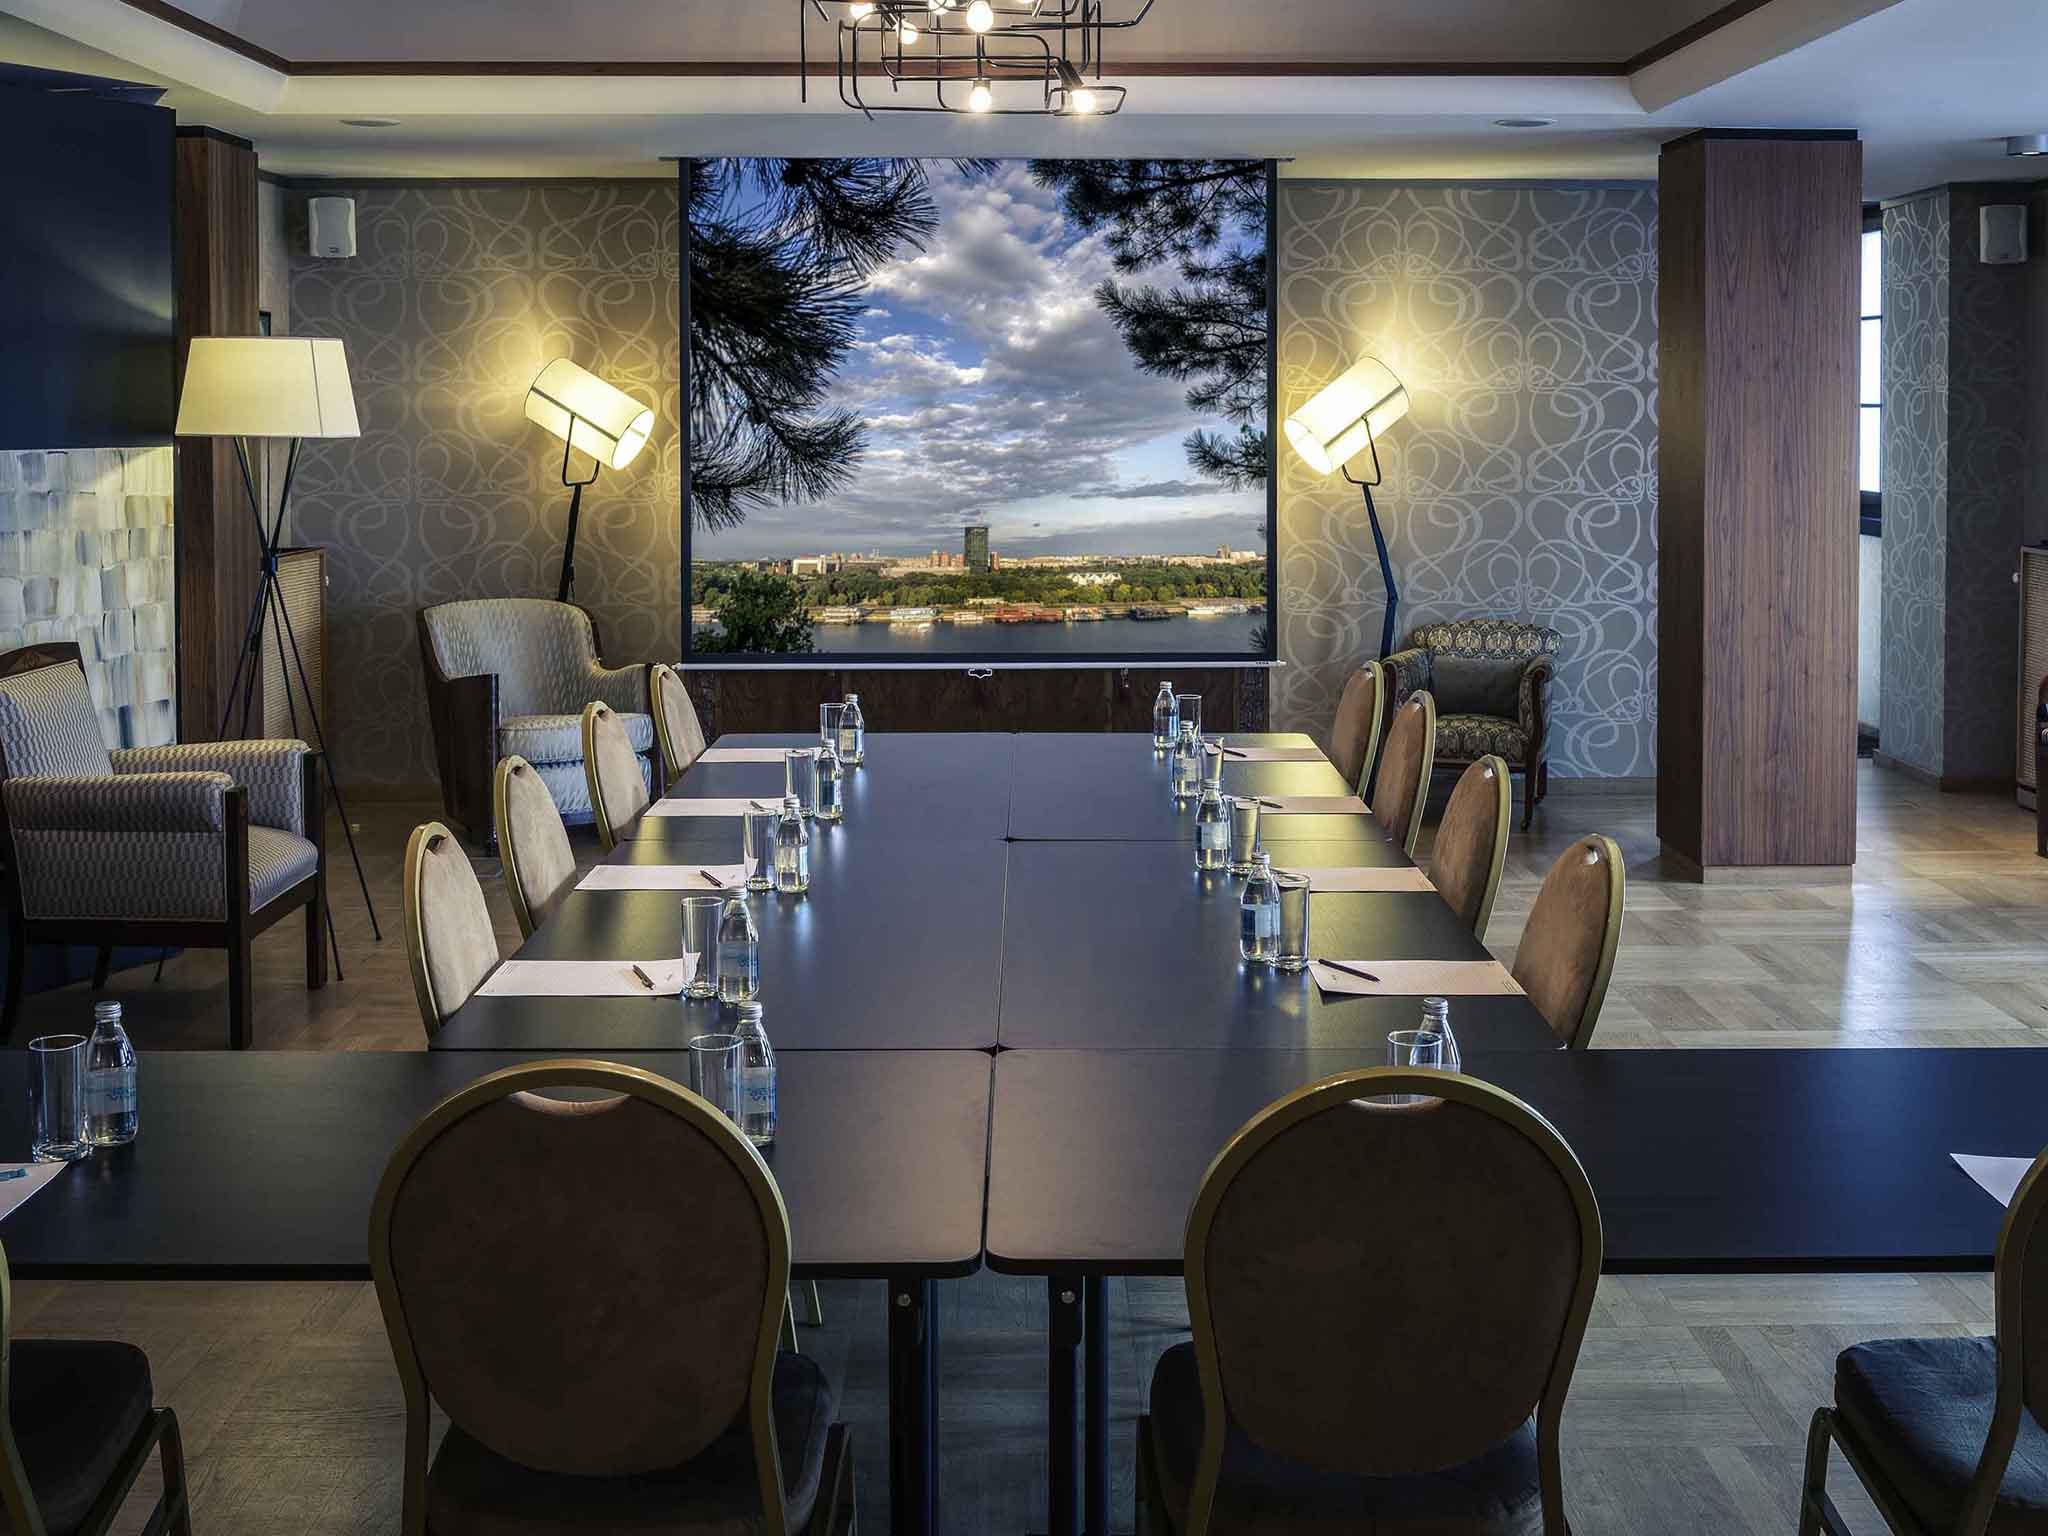 s m hardwood flooring of hotel in belgrade mercure belgrade excelsior intended for meetings and events mercure belgrade excelsior